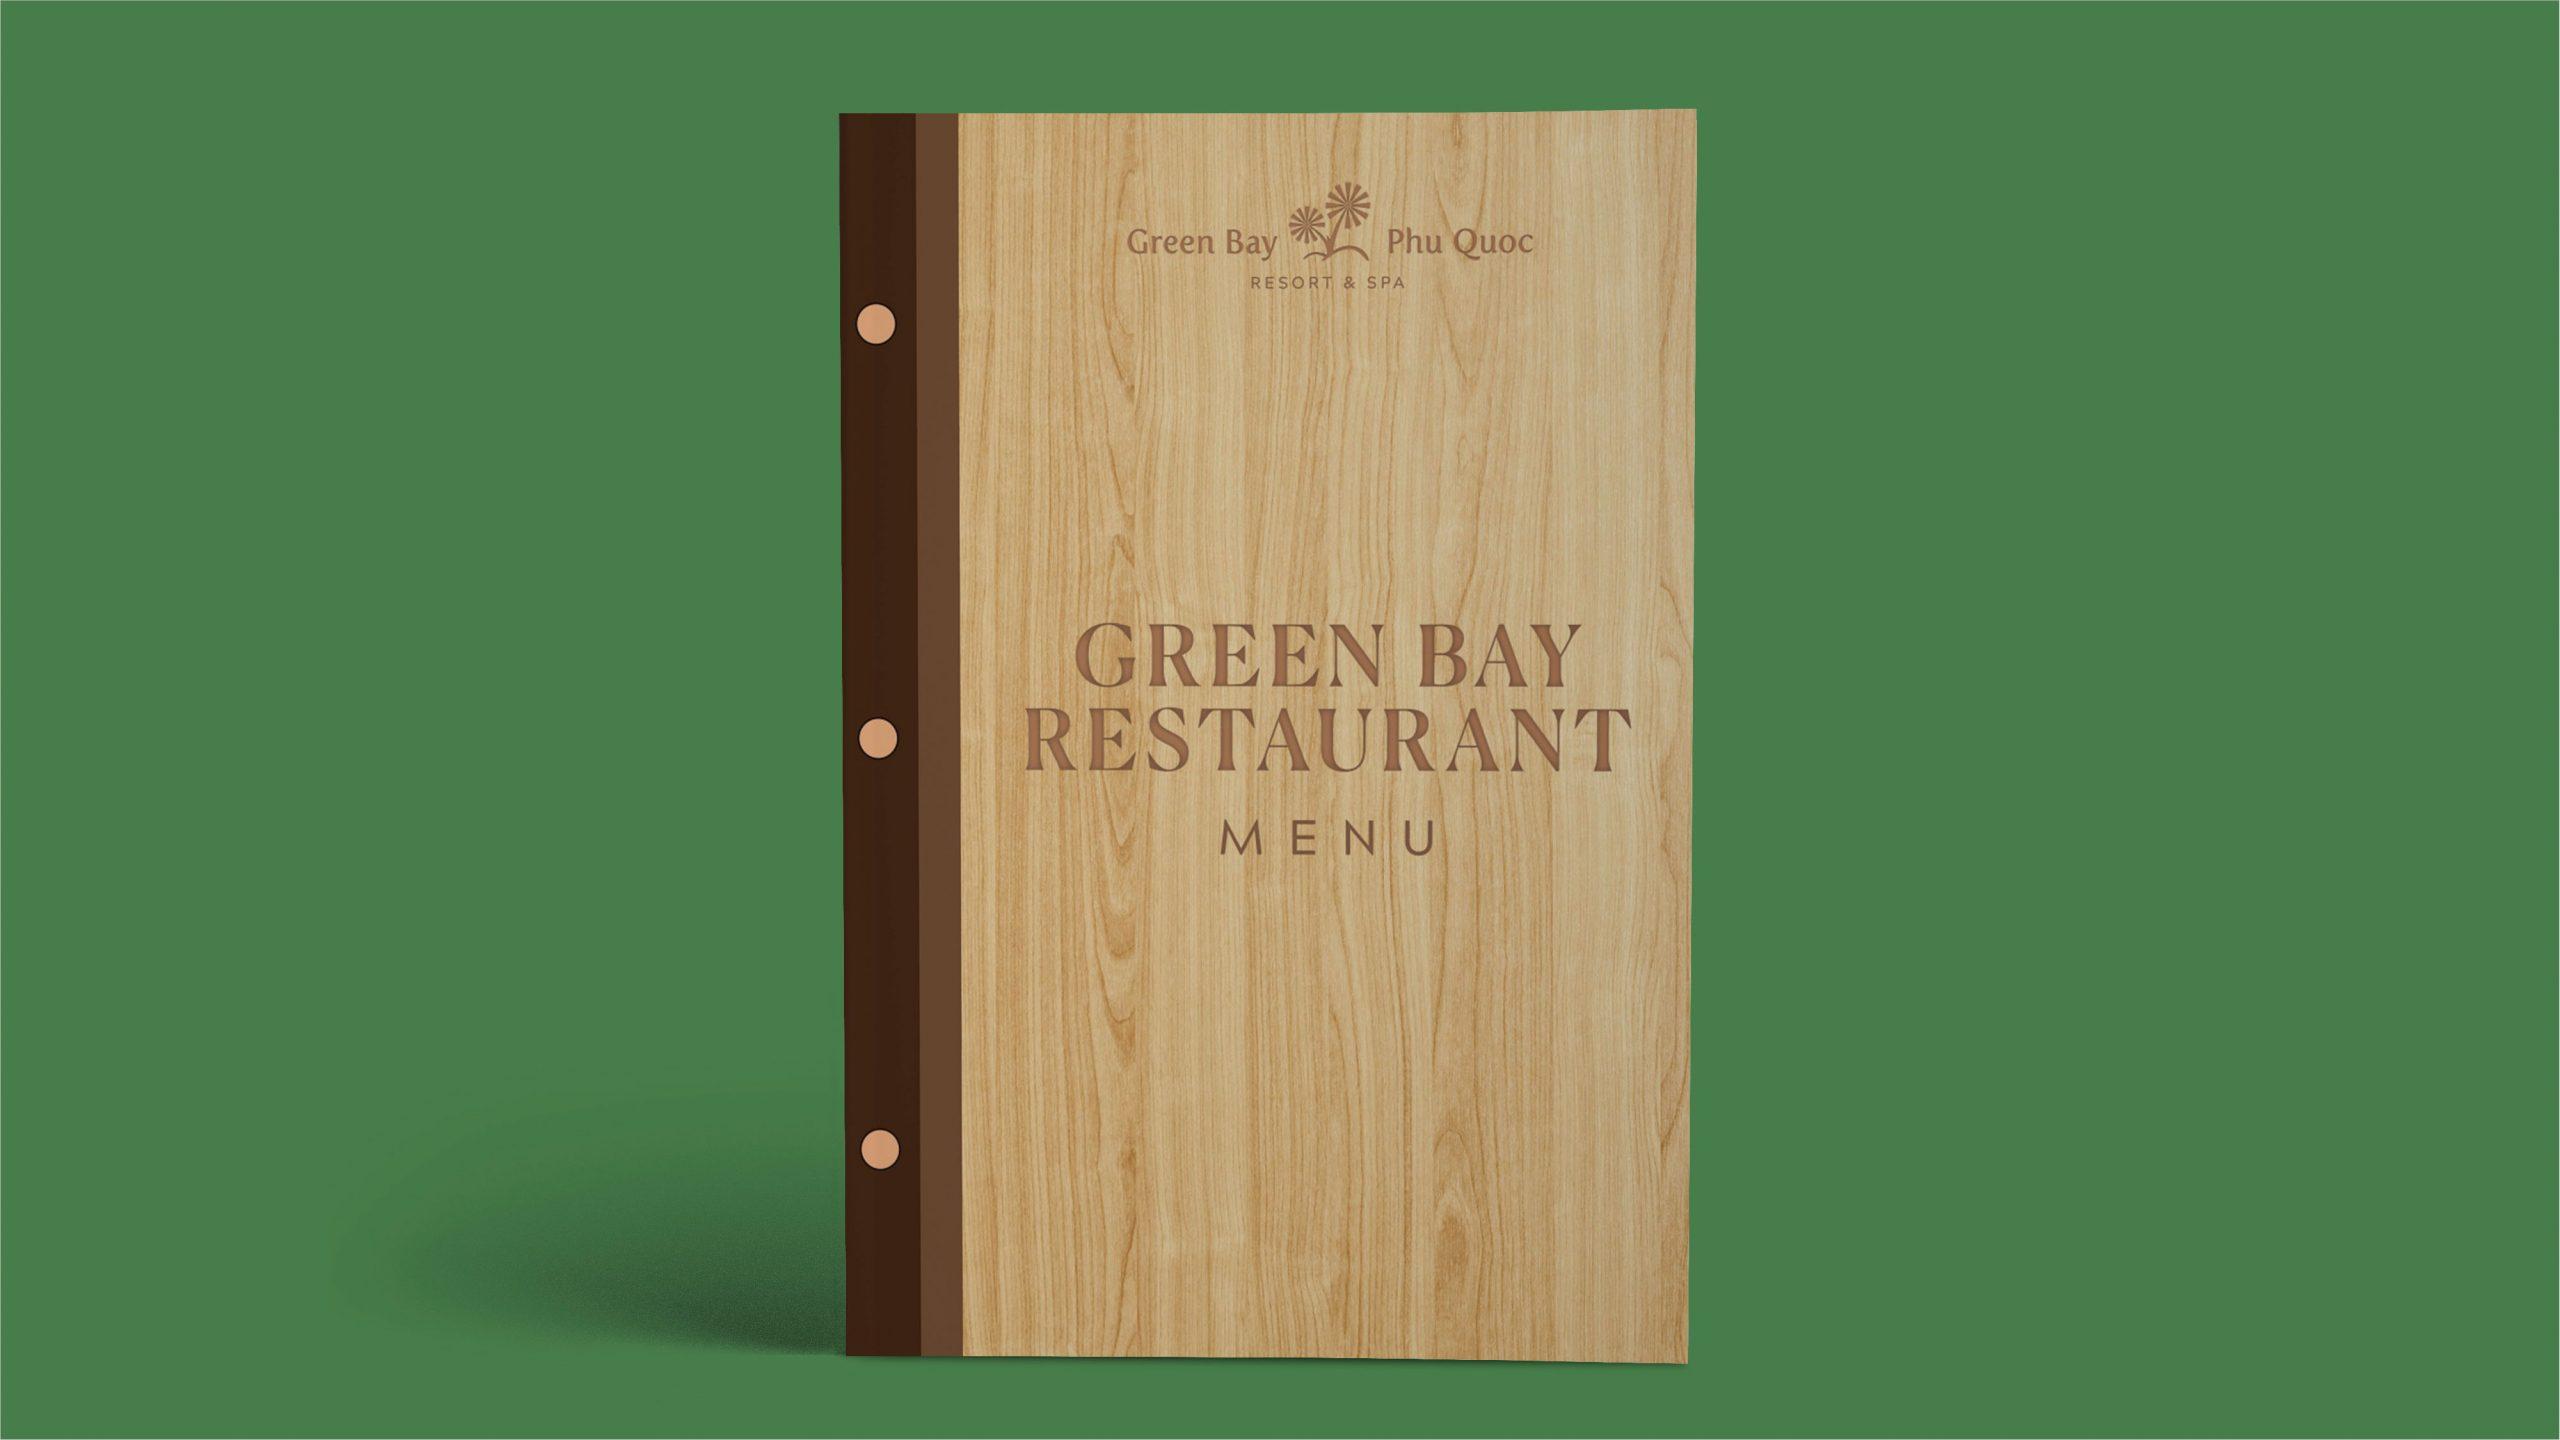 Greenbay-21